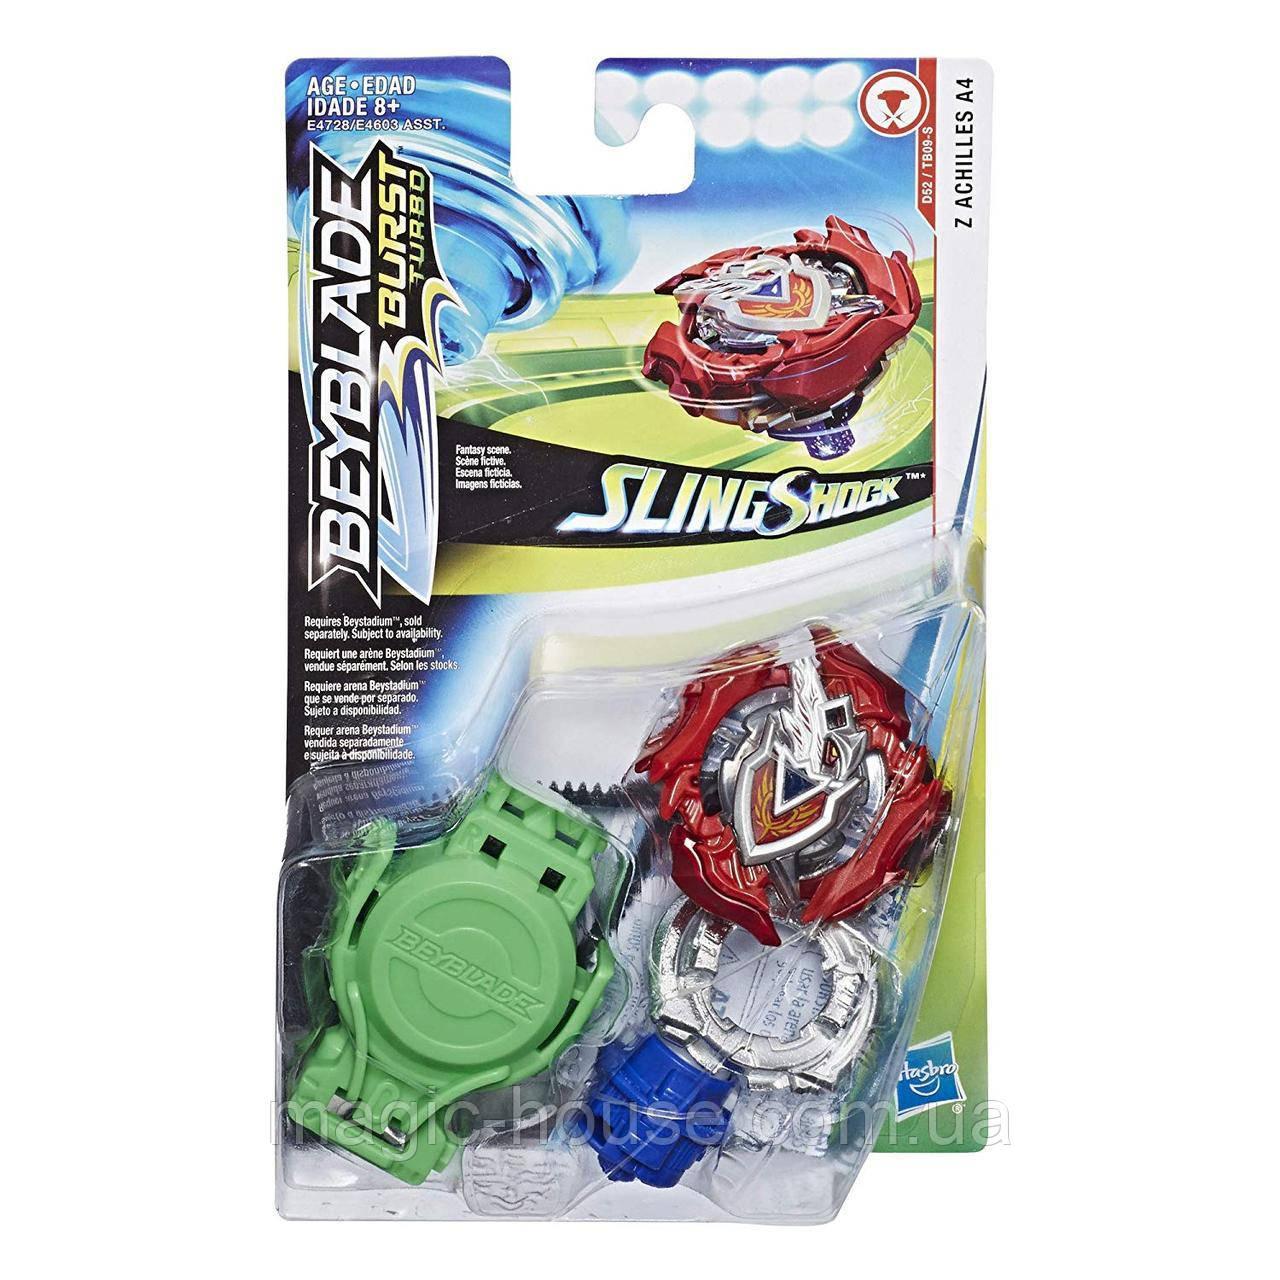 Бейблейд Ахіллес Burst Turbo Slingshock Starter Pack Achilles A4 від Hasbro